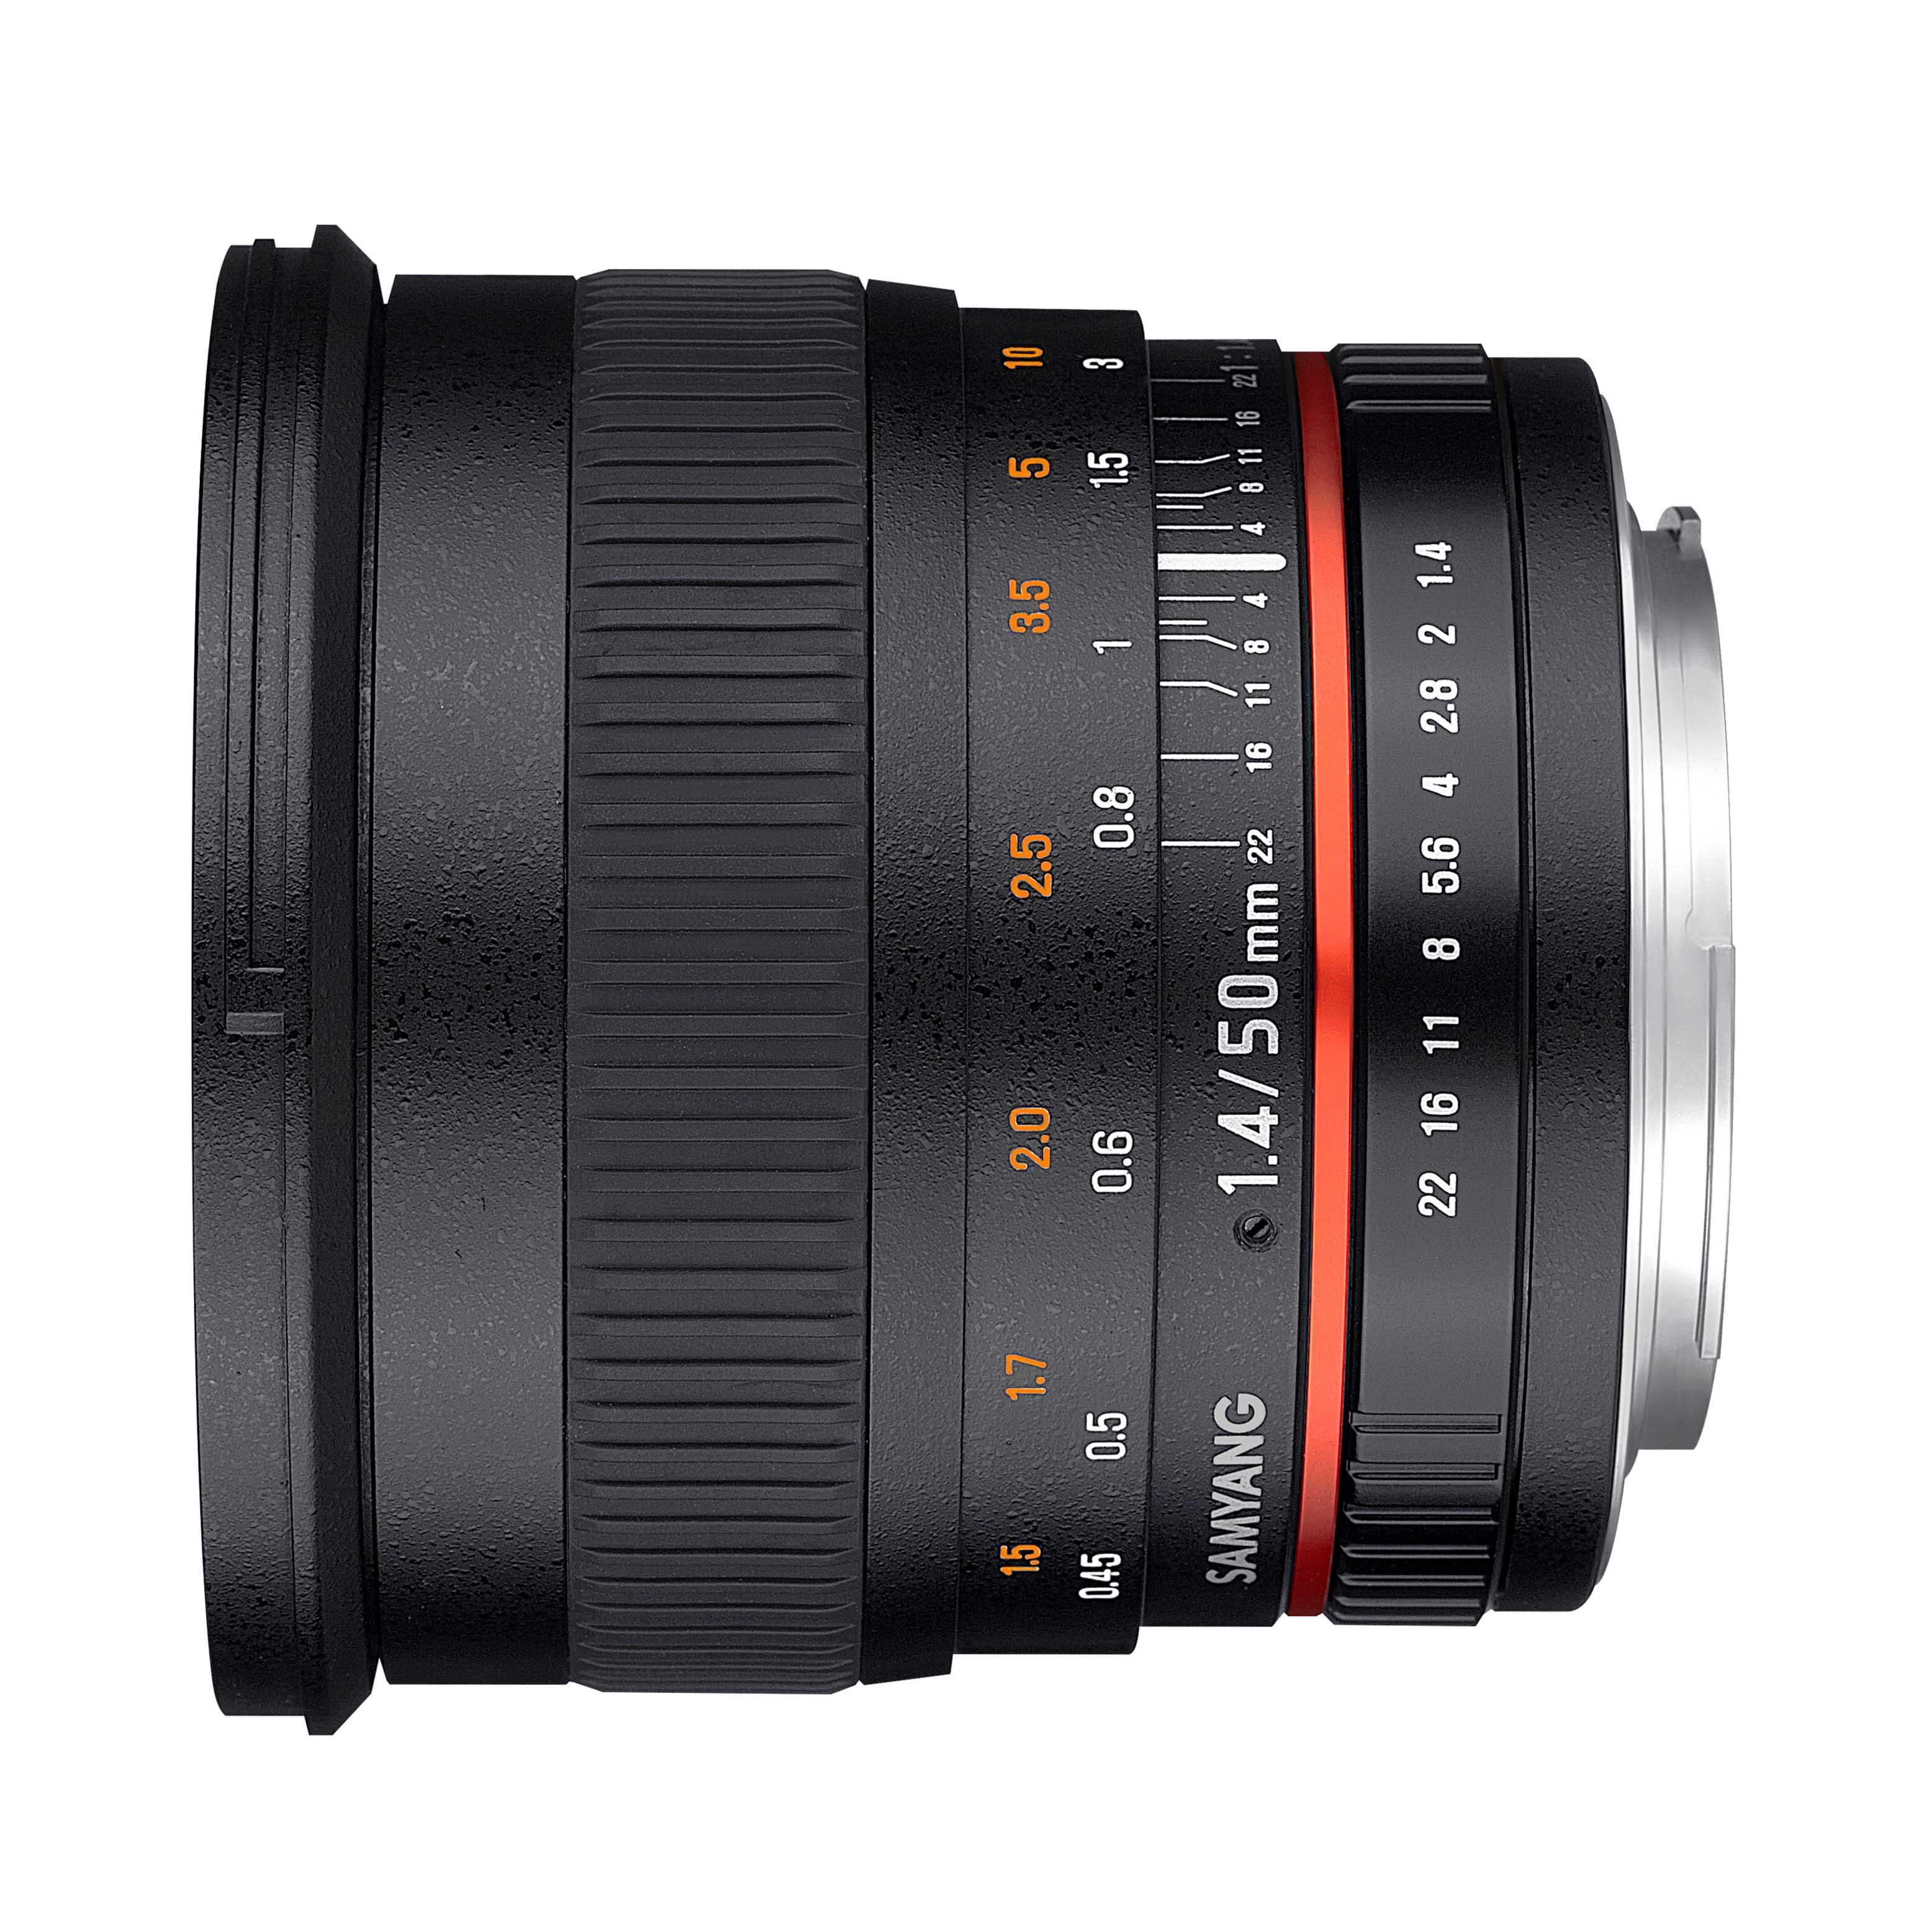 Objetivo fotogr/áfico DSLR para Canon EF Samyang F1111101101 Distancia Focal Fija 50mm, Apertura f//1.4-22 AS UMC, di/ámetro Filtro: 77mm Negro